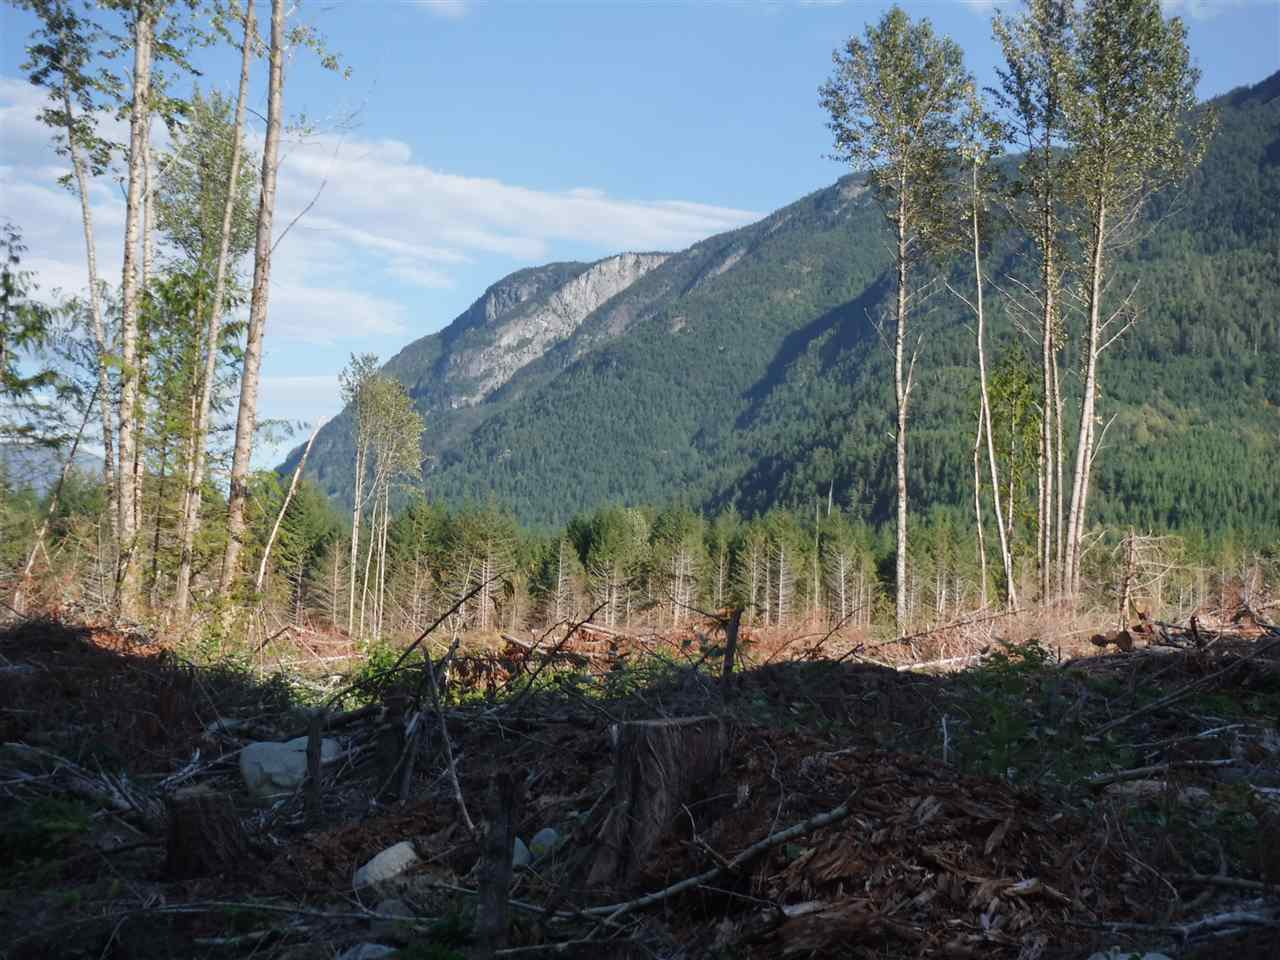 Photo 15: Photos: 3975 EAST HAMMER Road in Bella Coola: Bella Coola/Hagensborg Land for sale (Williams Lake (Zone 27))  : MLS®# R2483527